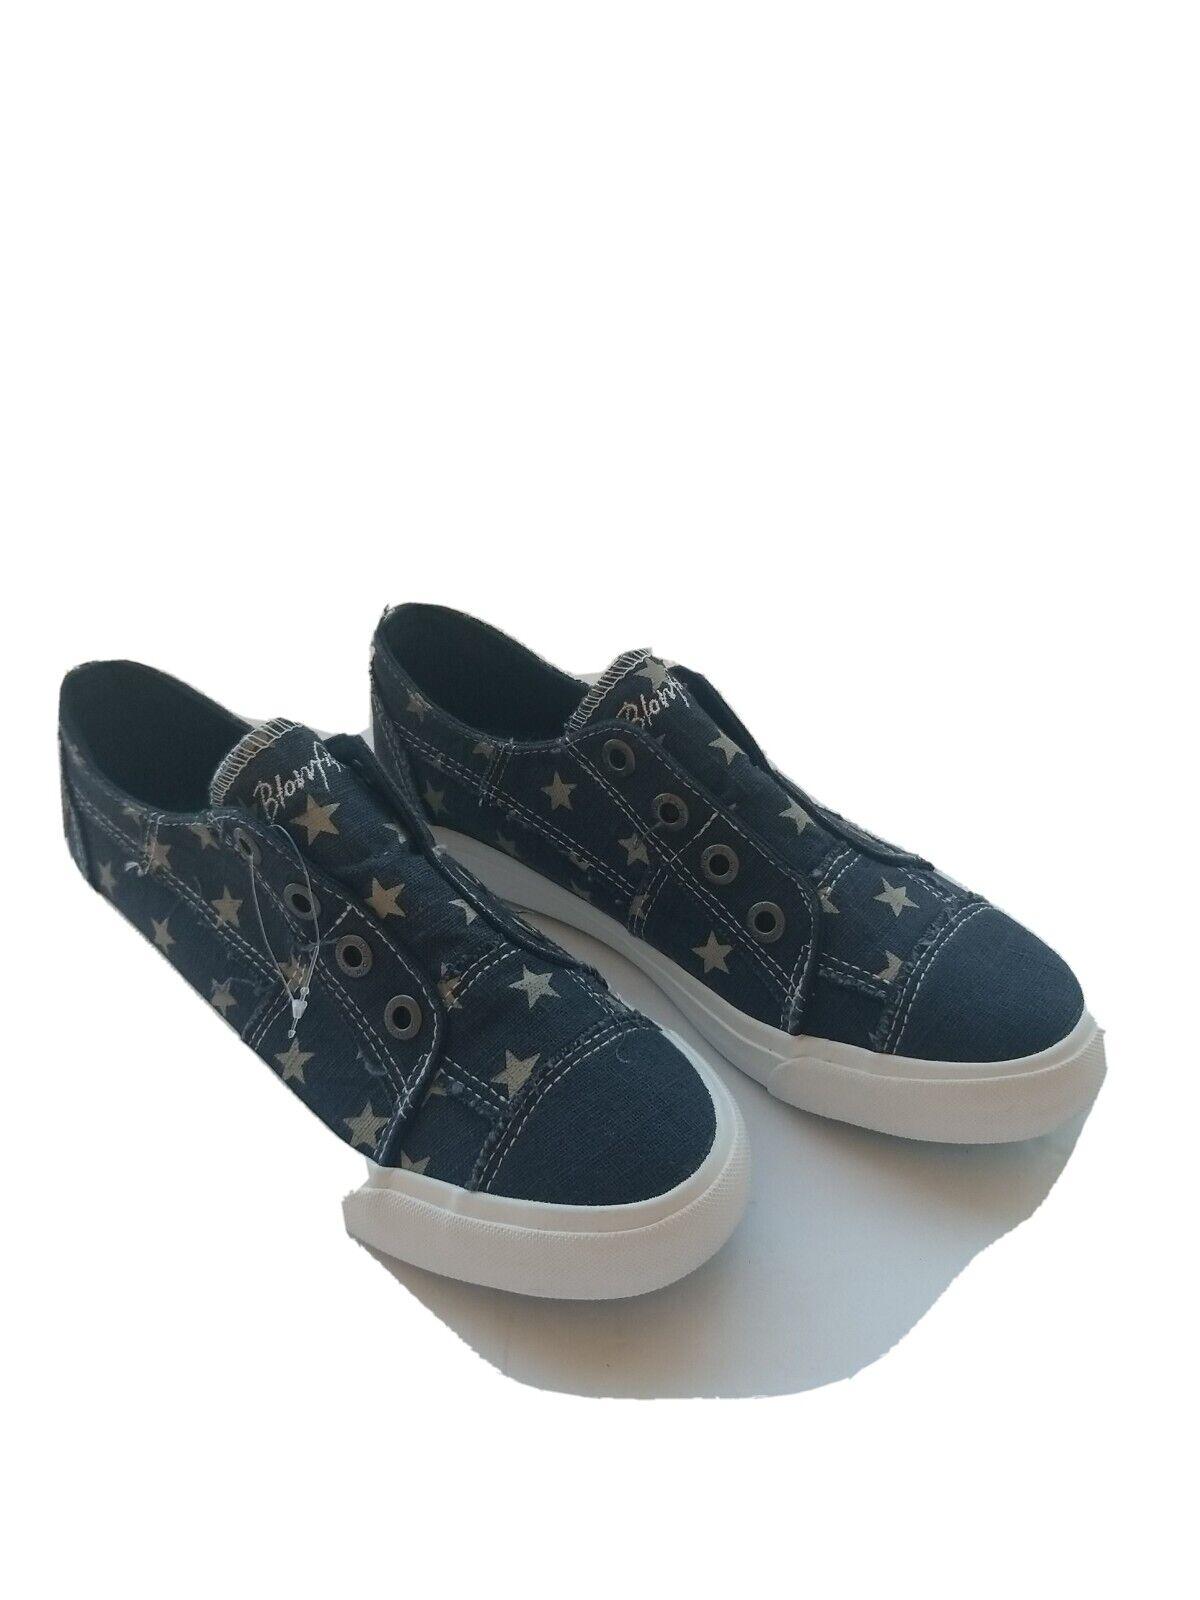 Blowfish Malibu dark blue with stars slip on casual sneakers womens size 7.5